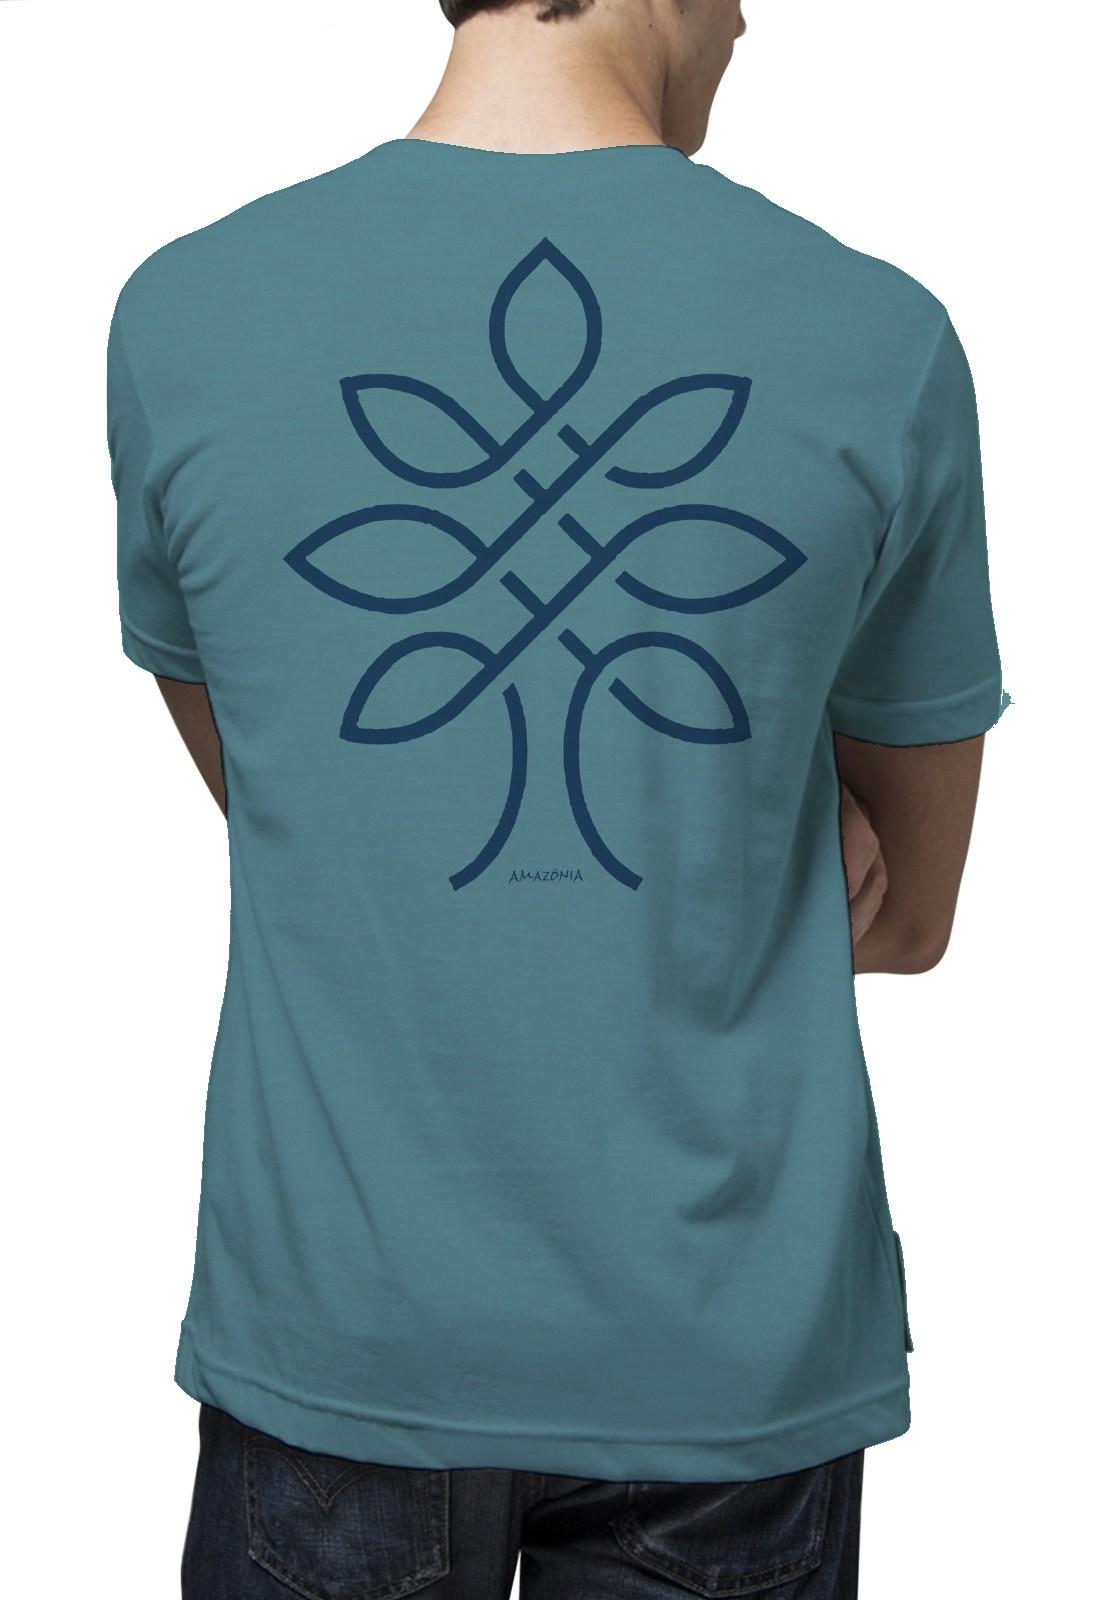 Camiseta Amazônia One Tree - Mescla Azul